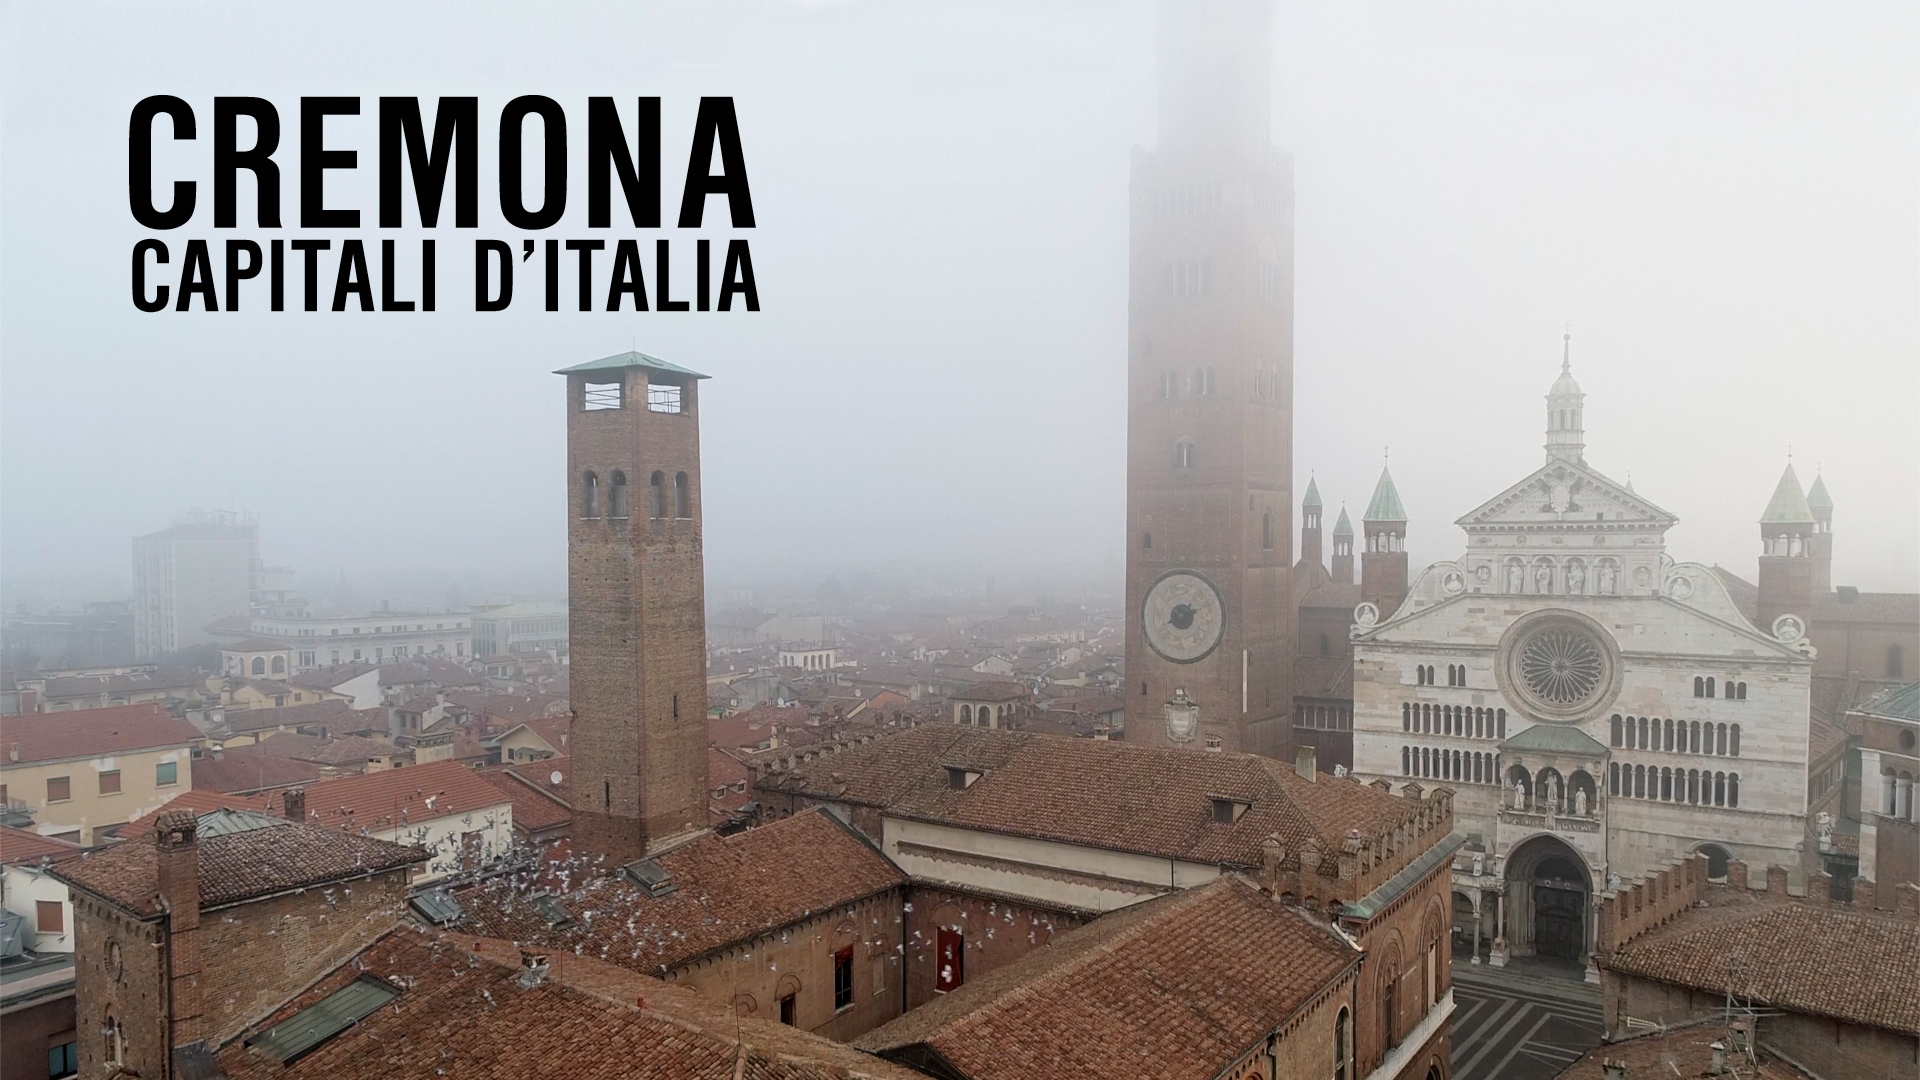 Capitali d'Italia Cremona